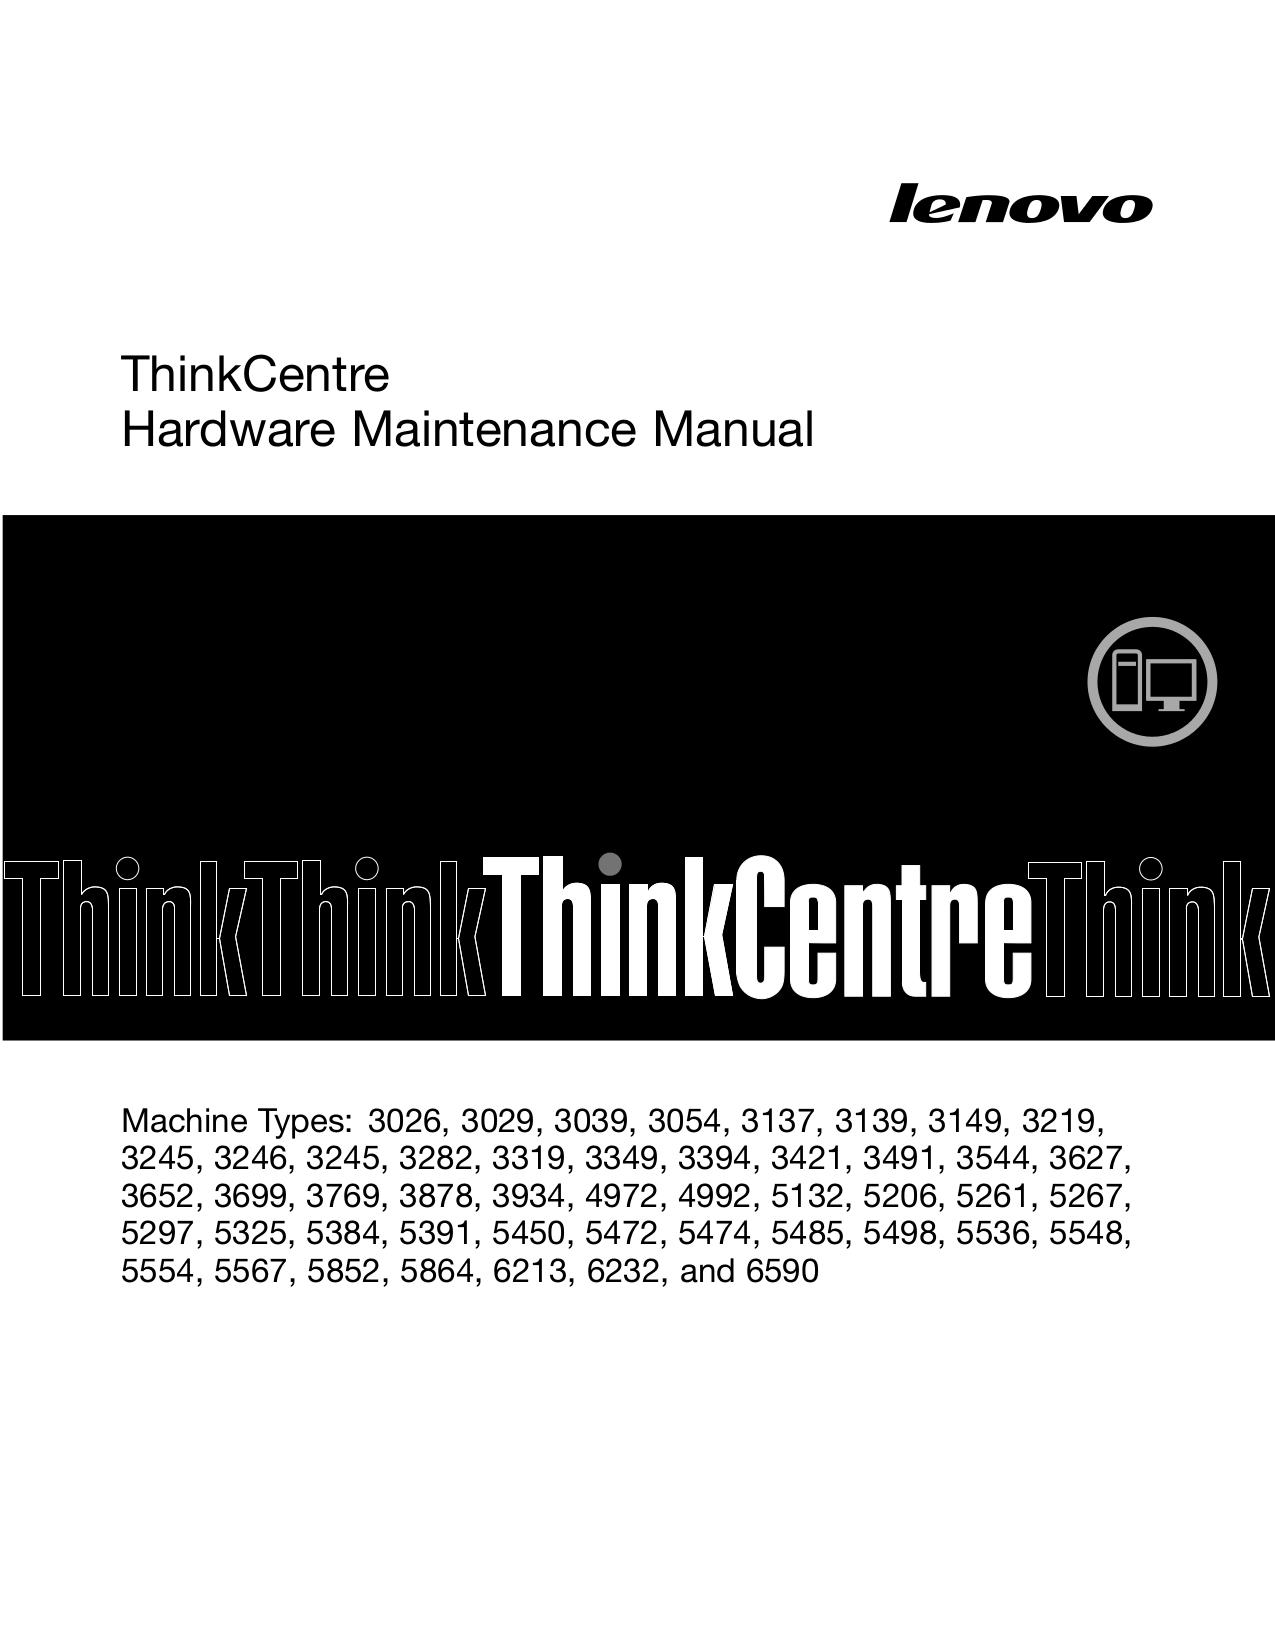 pdf for Lenovo Desktop ThinkCentre M90 5554 manual